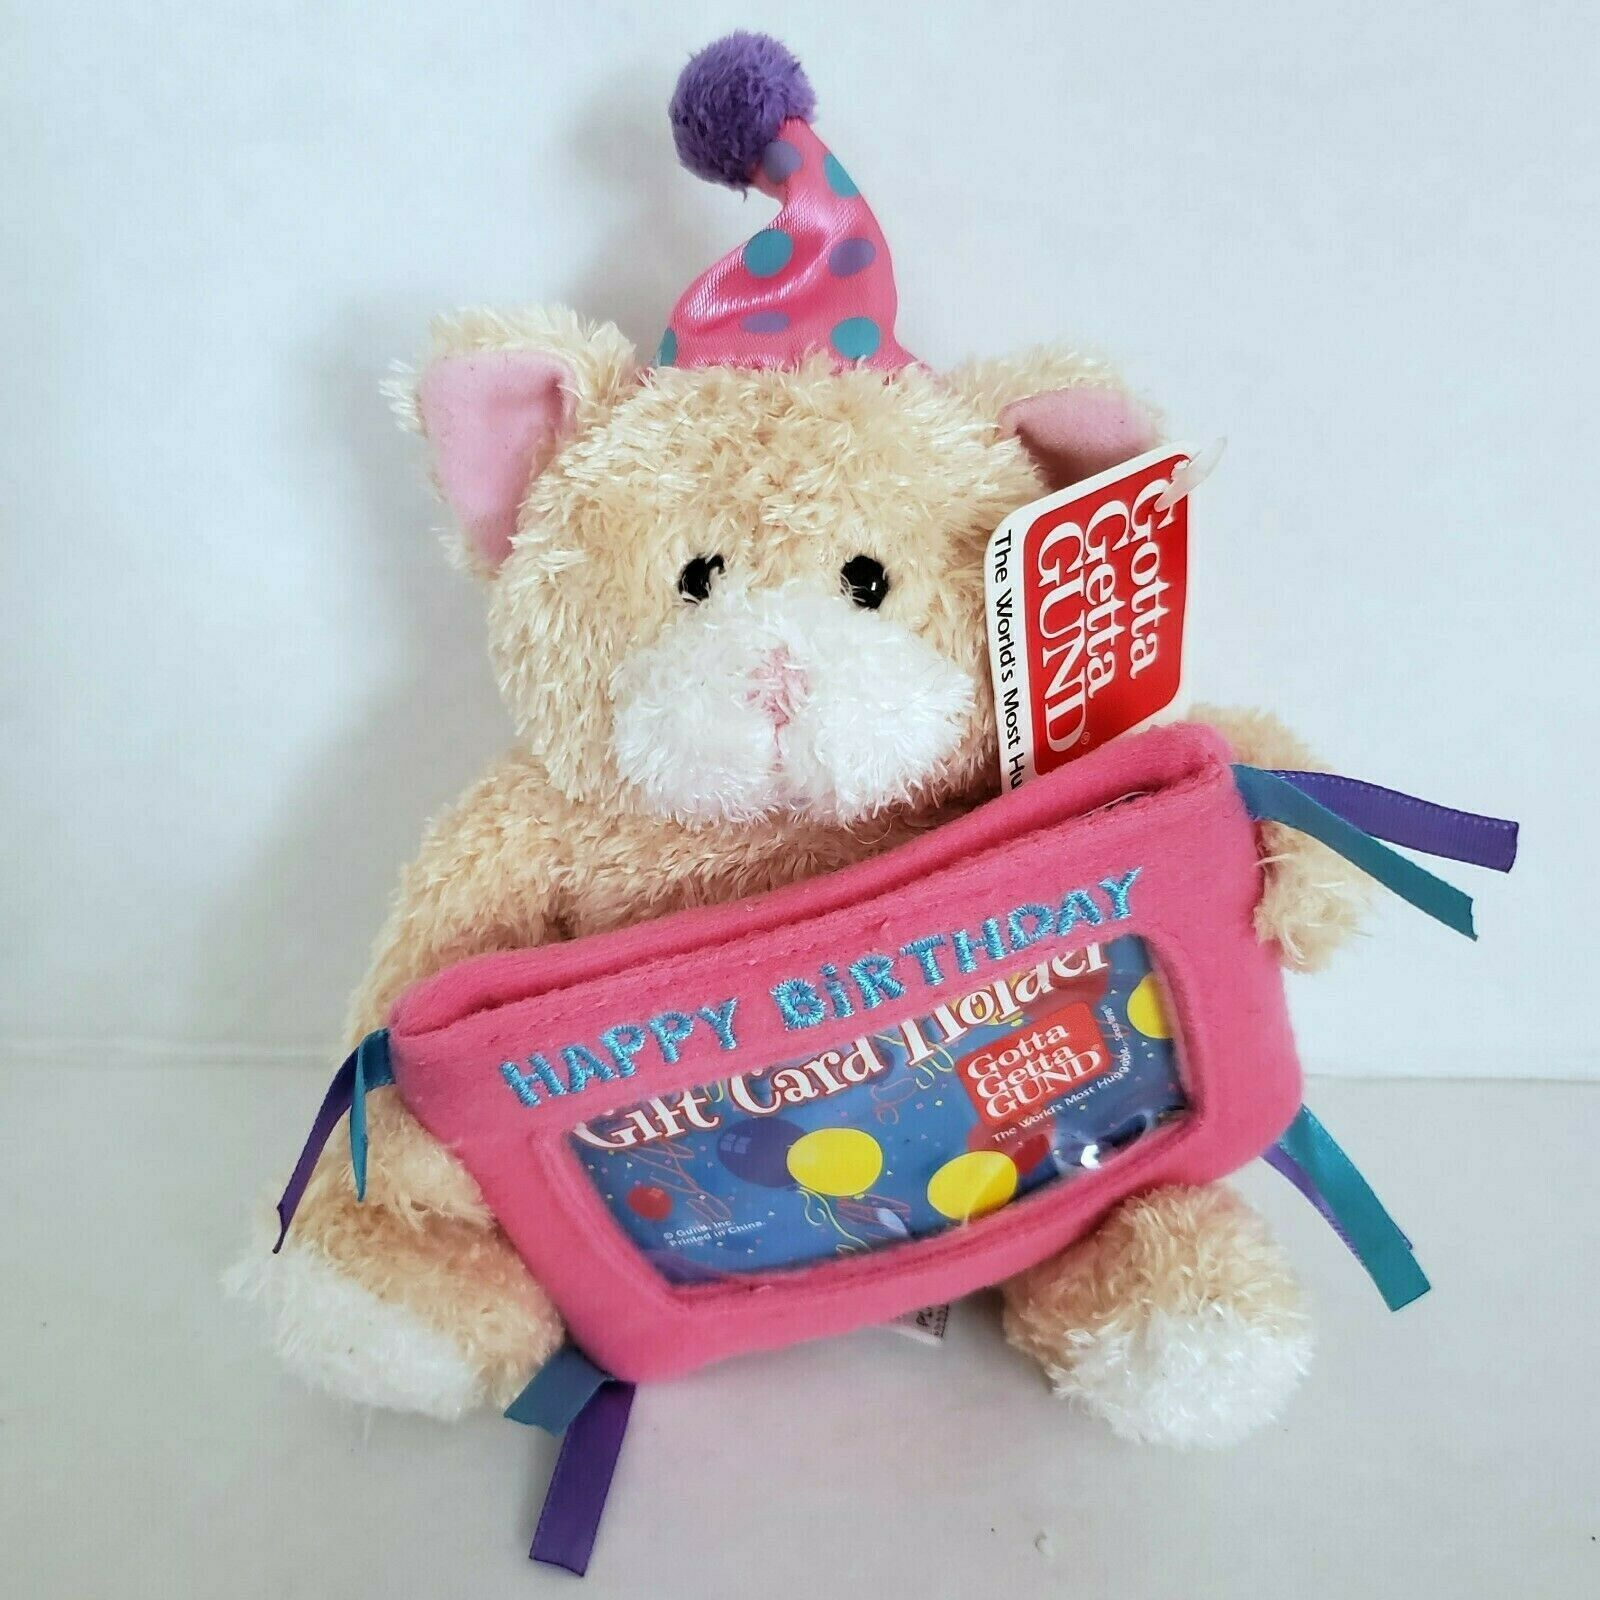 Gund Cool Cat Birthday Gift Card Holder Plush Stuffed Animal